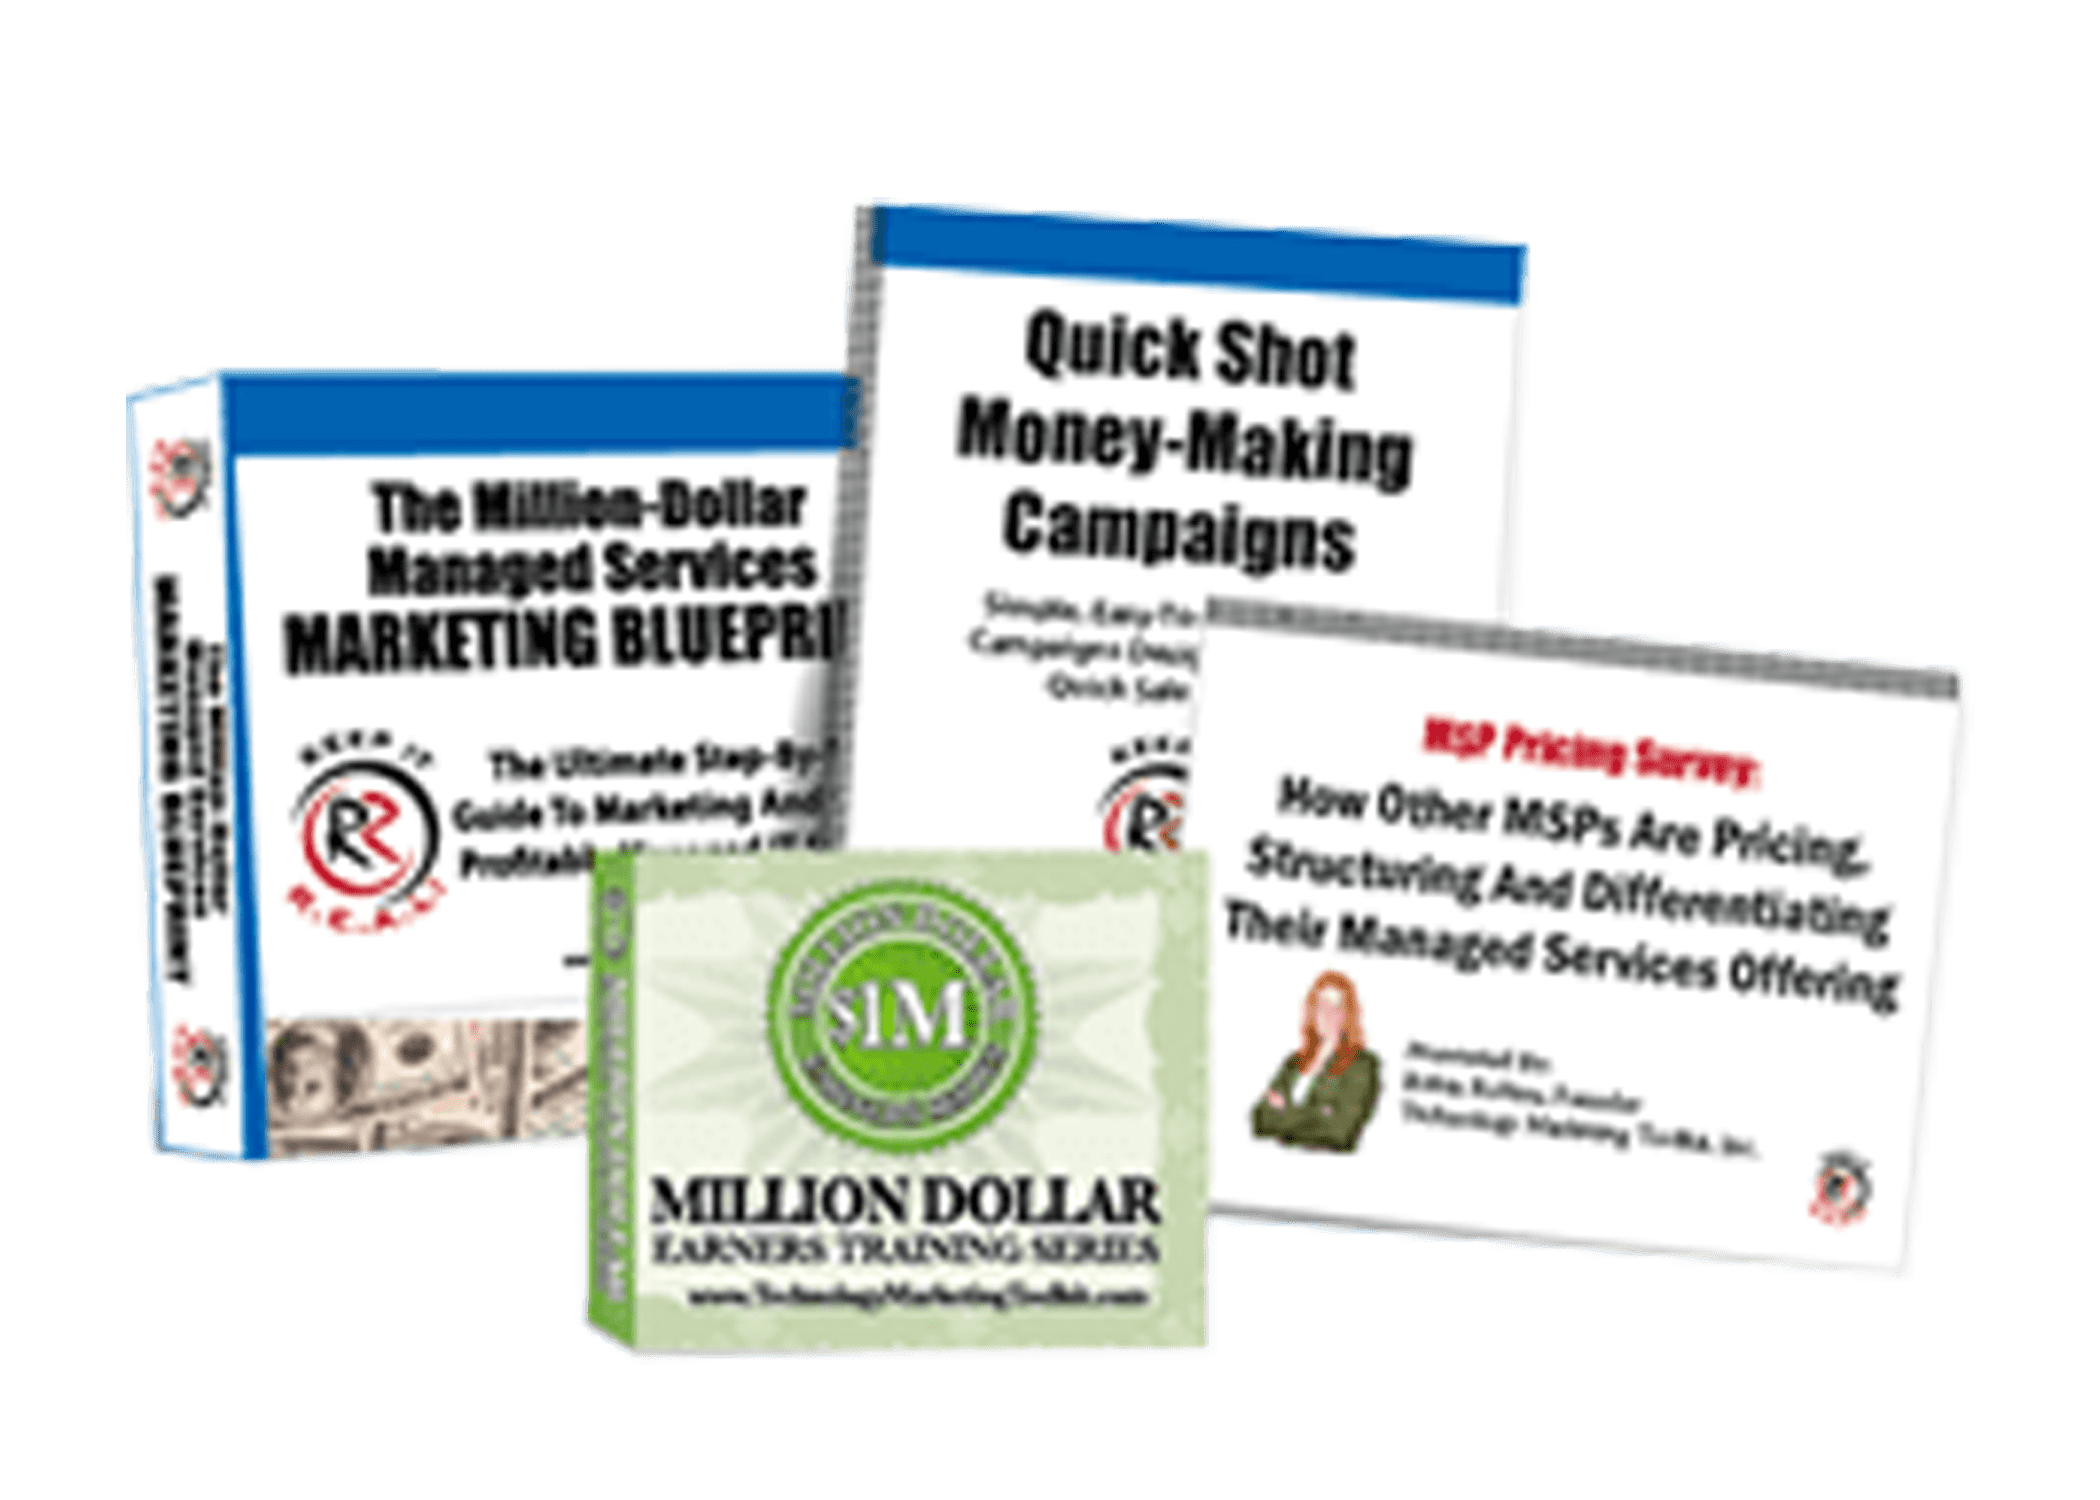 The Million-Dollar Managed Services Marketing Blueprint   Robin Robins